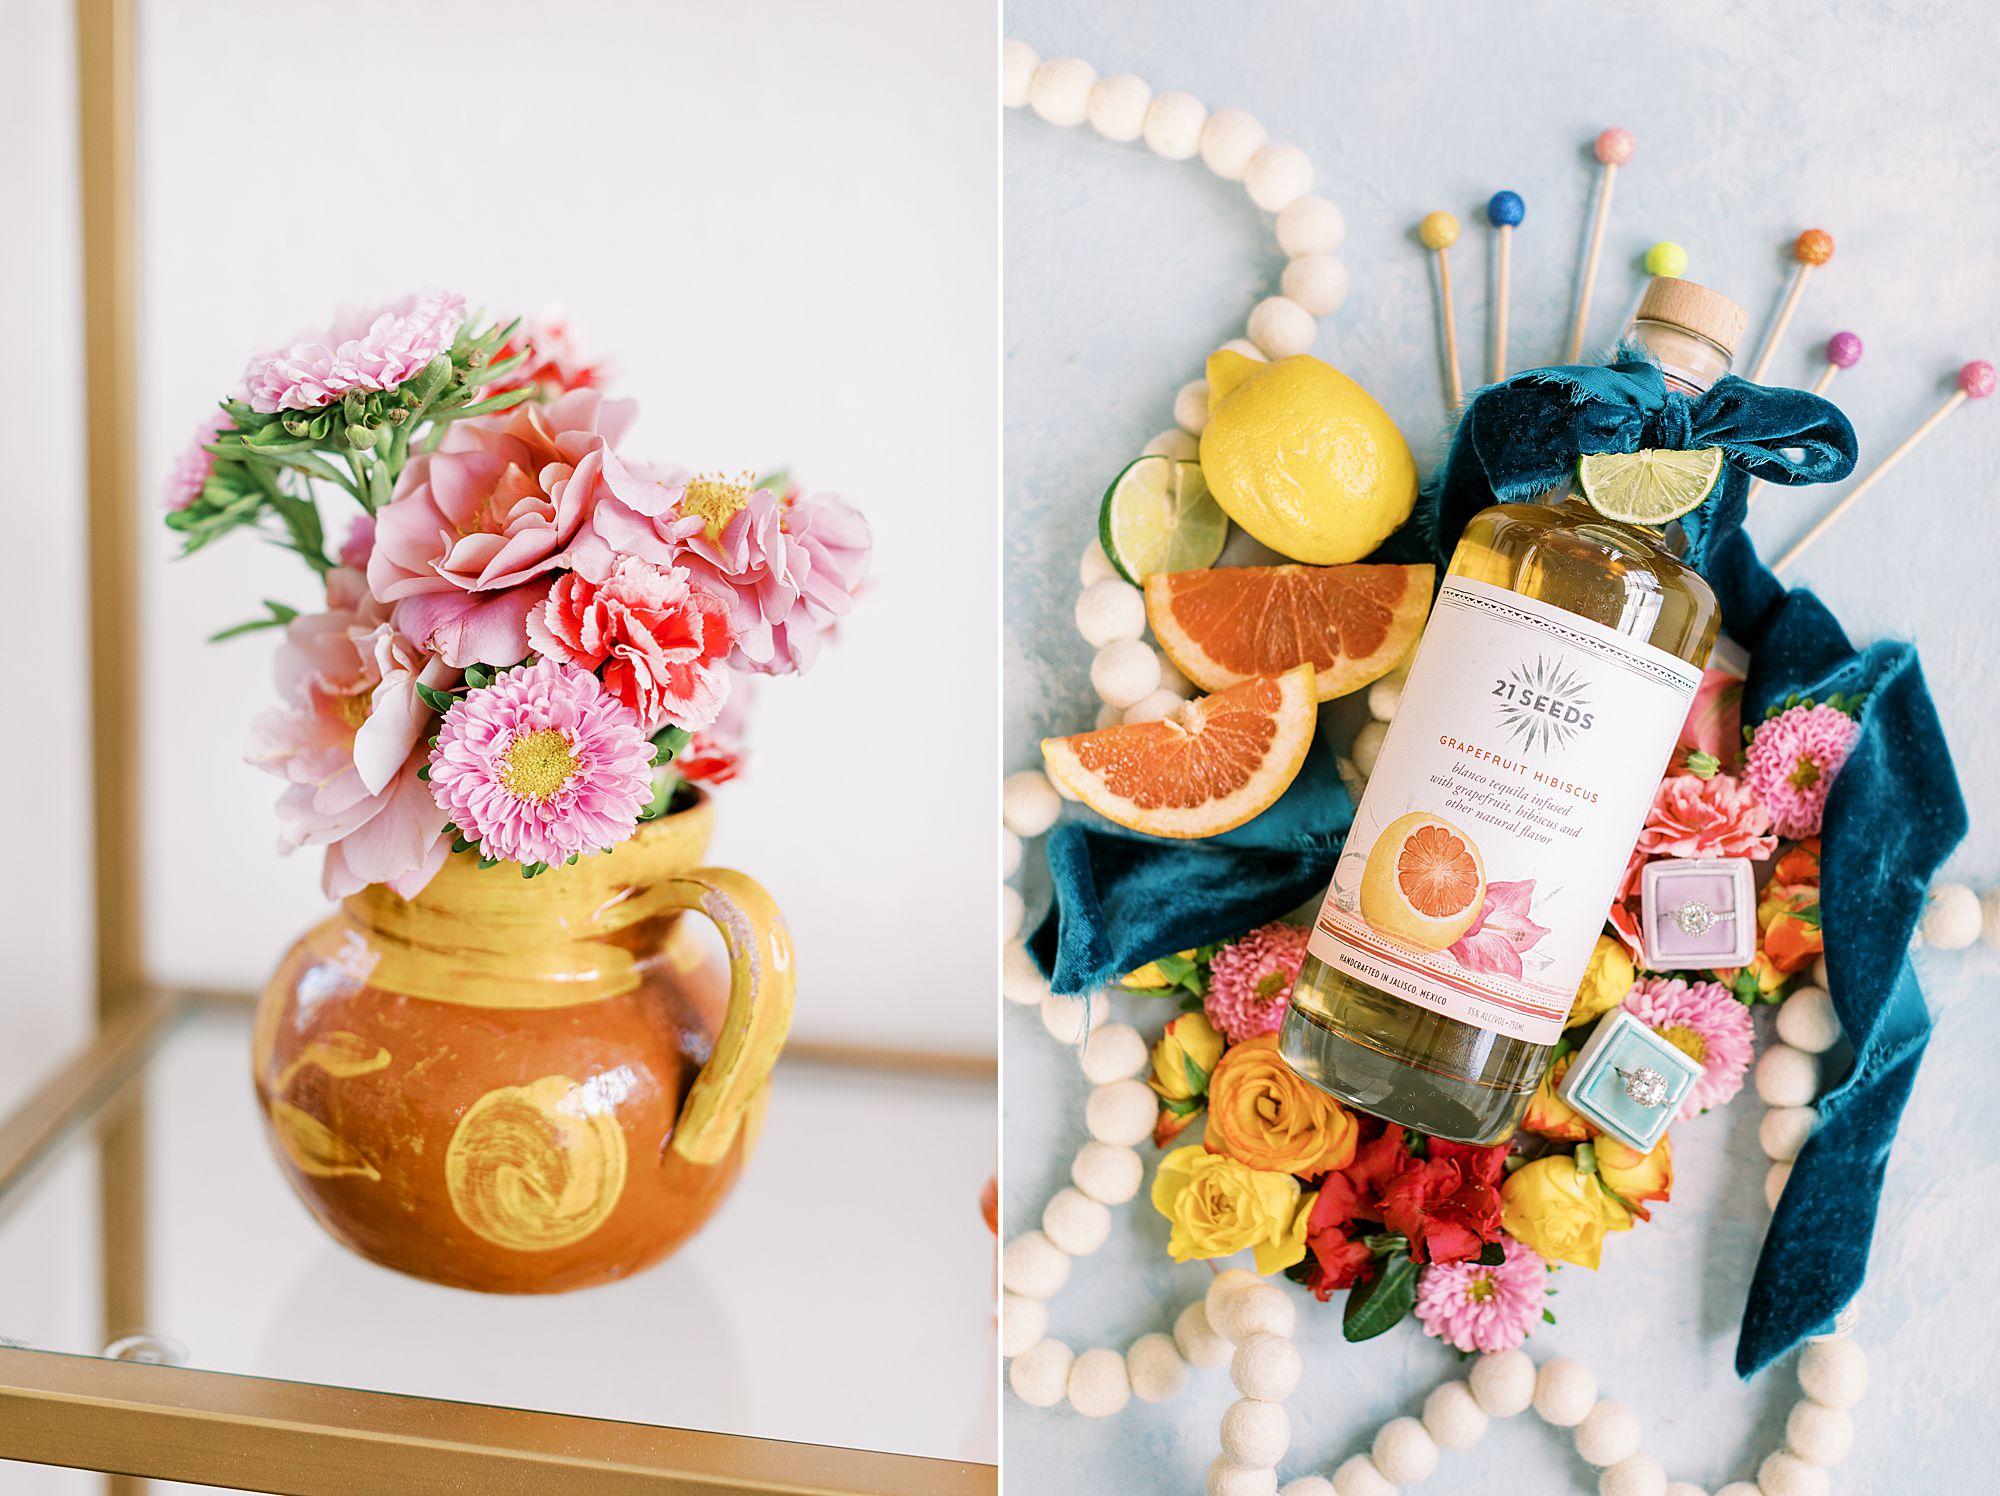 Cinco De Mayo Inspiration for Your FIesta - Party Crush Studio and Ashley Baumgartner_0020.jpg